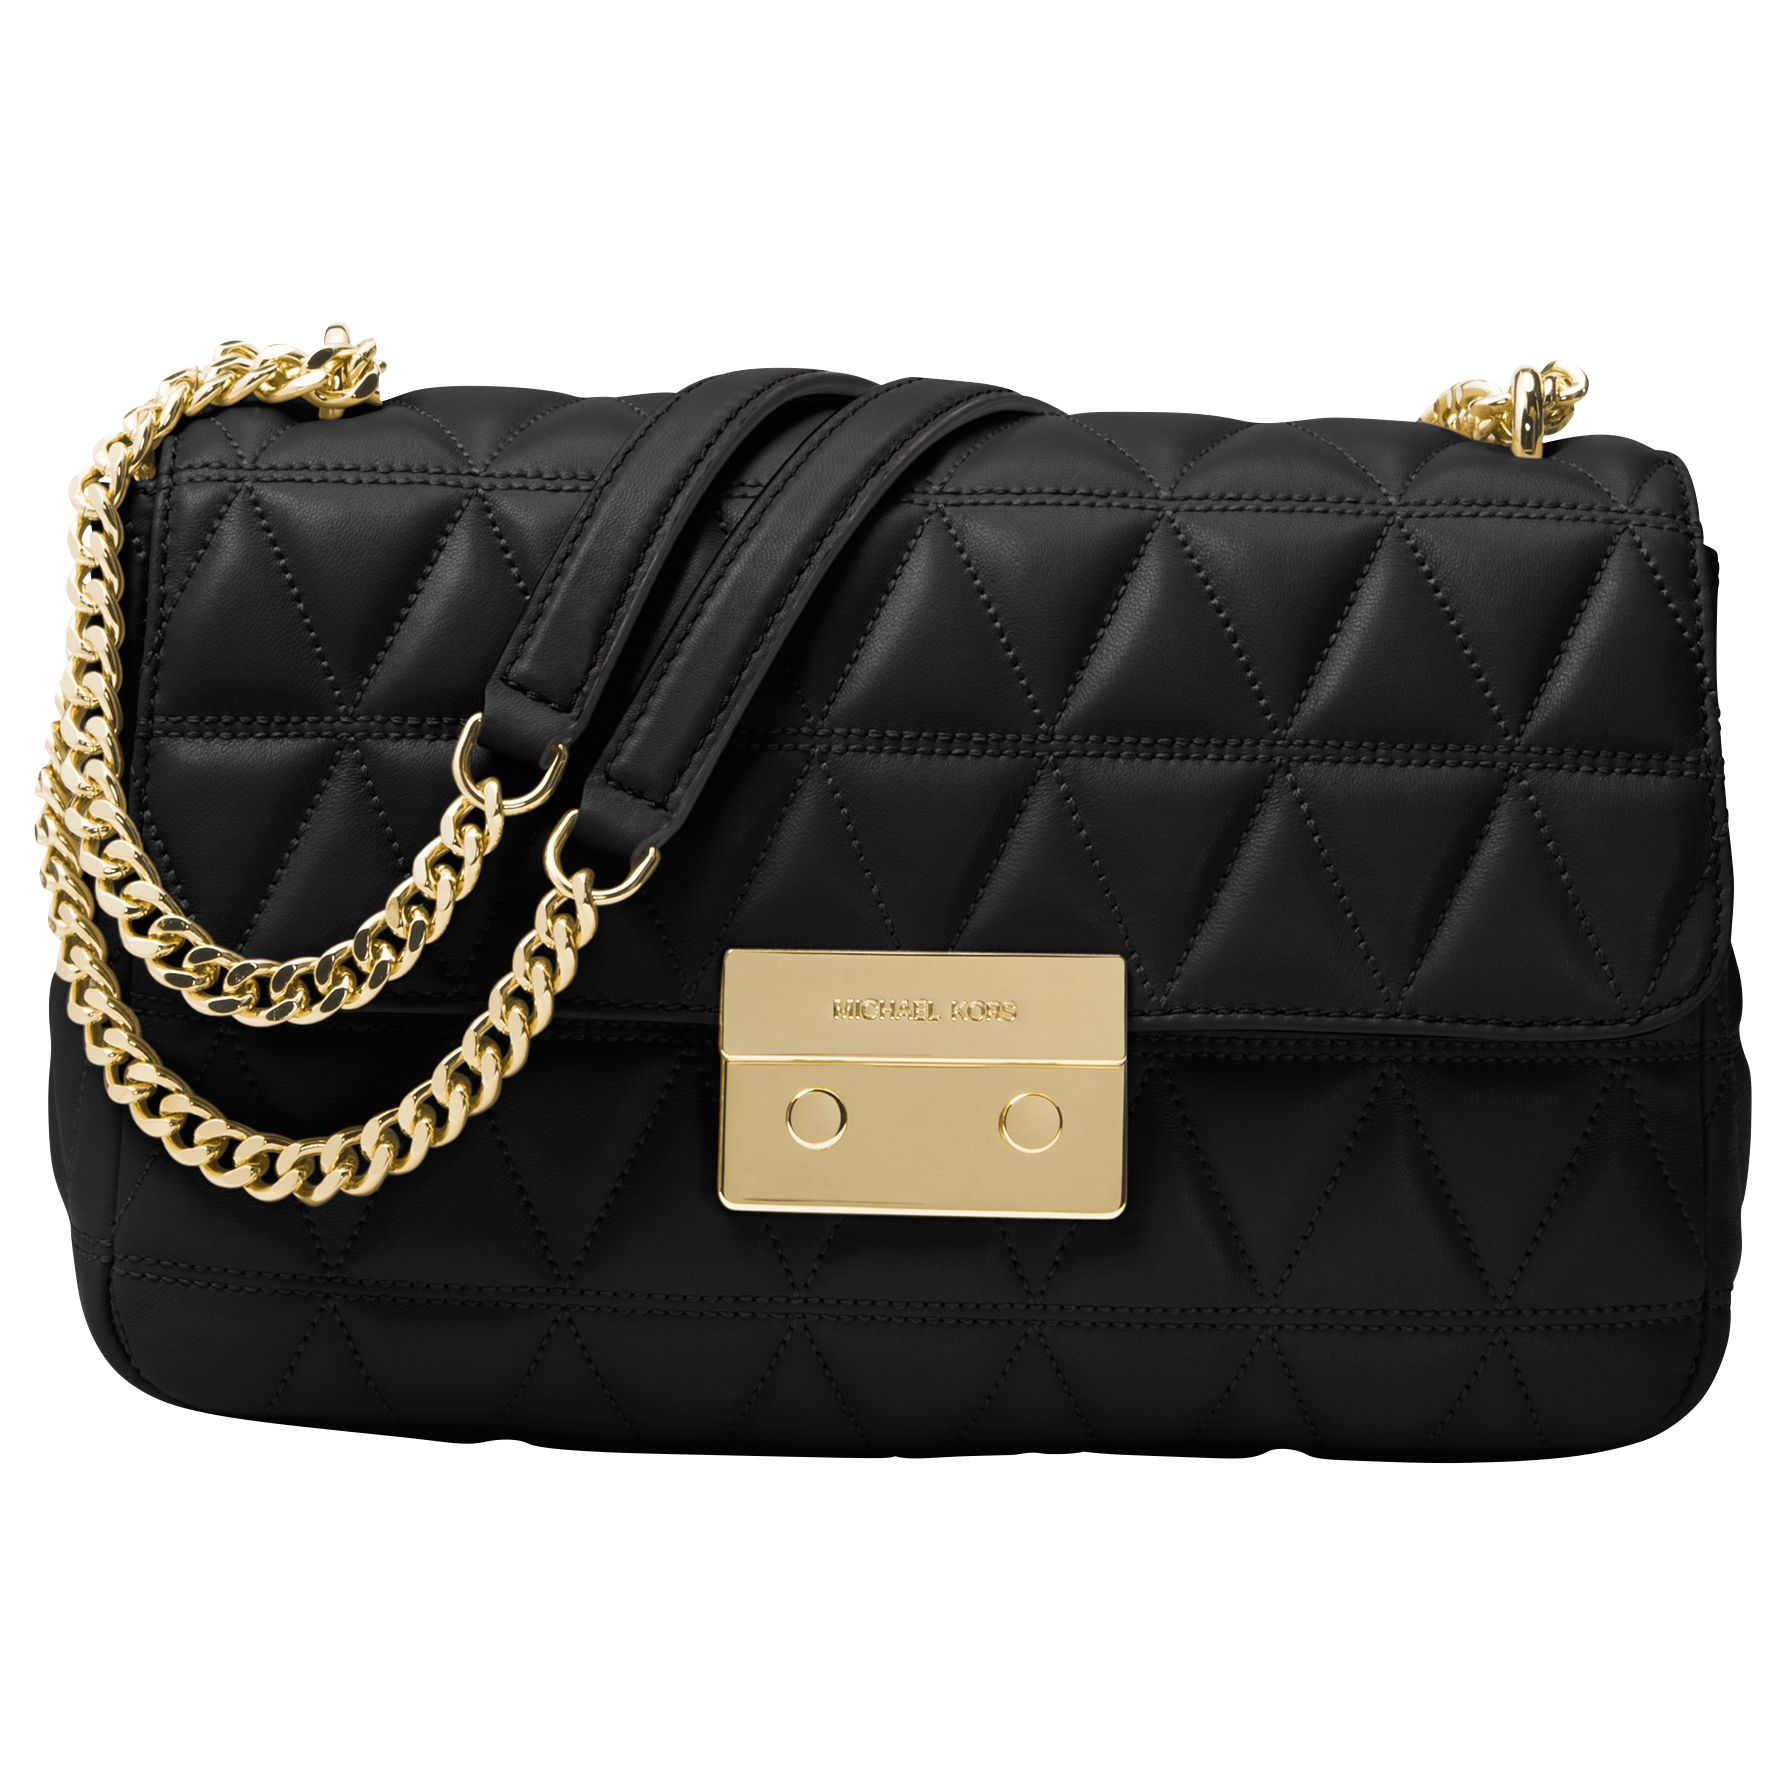 4091280865ee0 MICHAEL Michael Kors Sloan Leather Long Chain Shoulder Bag